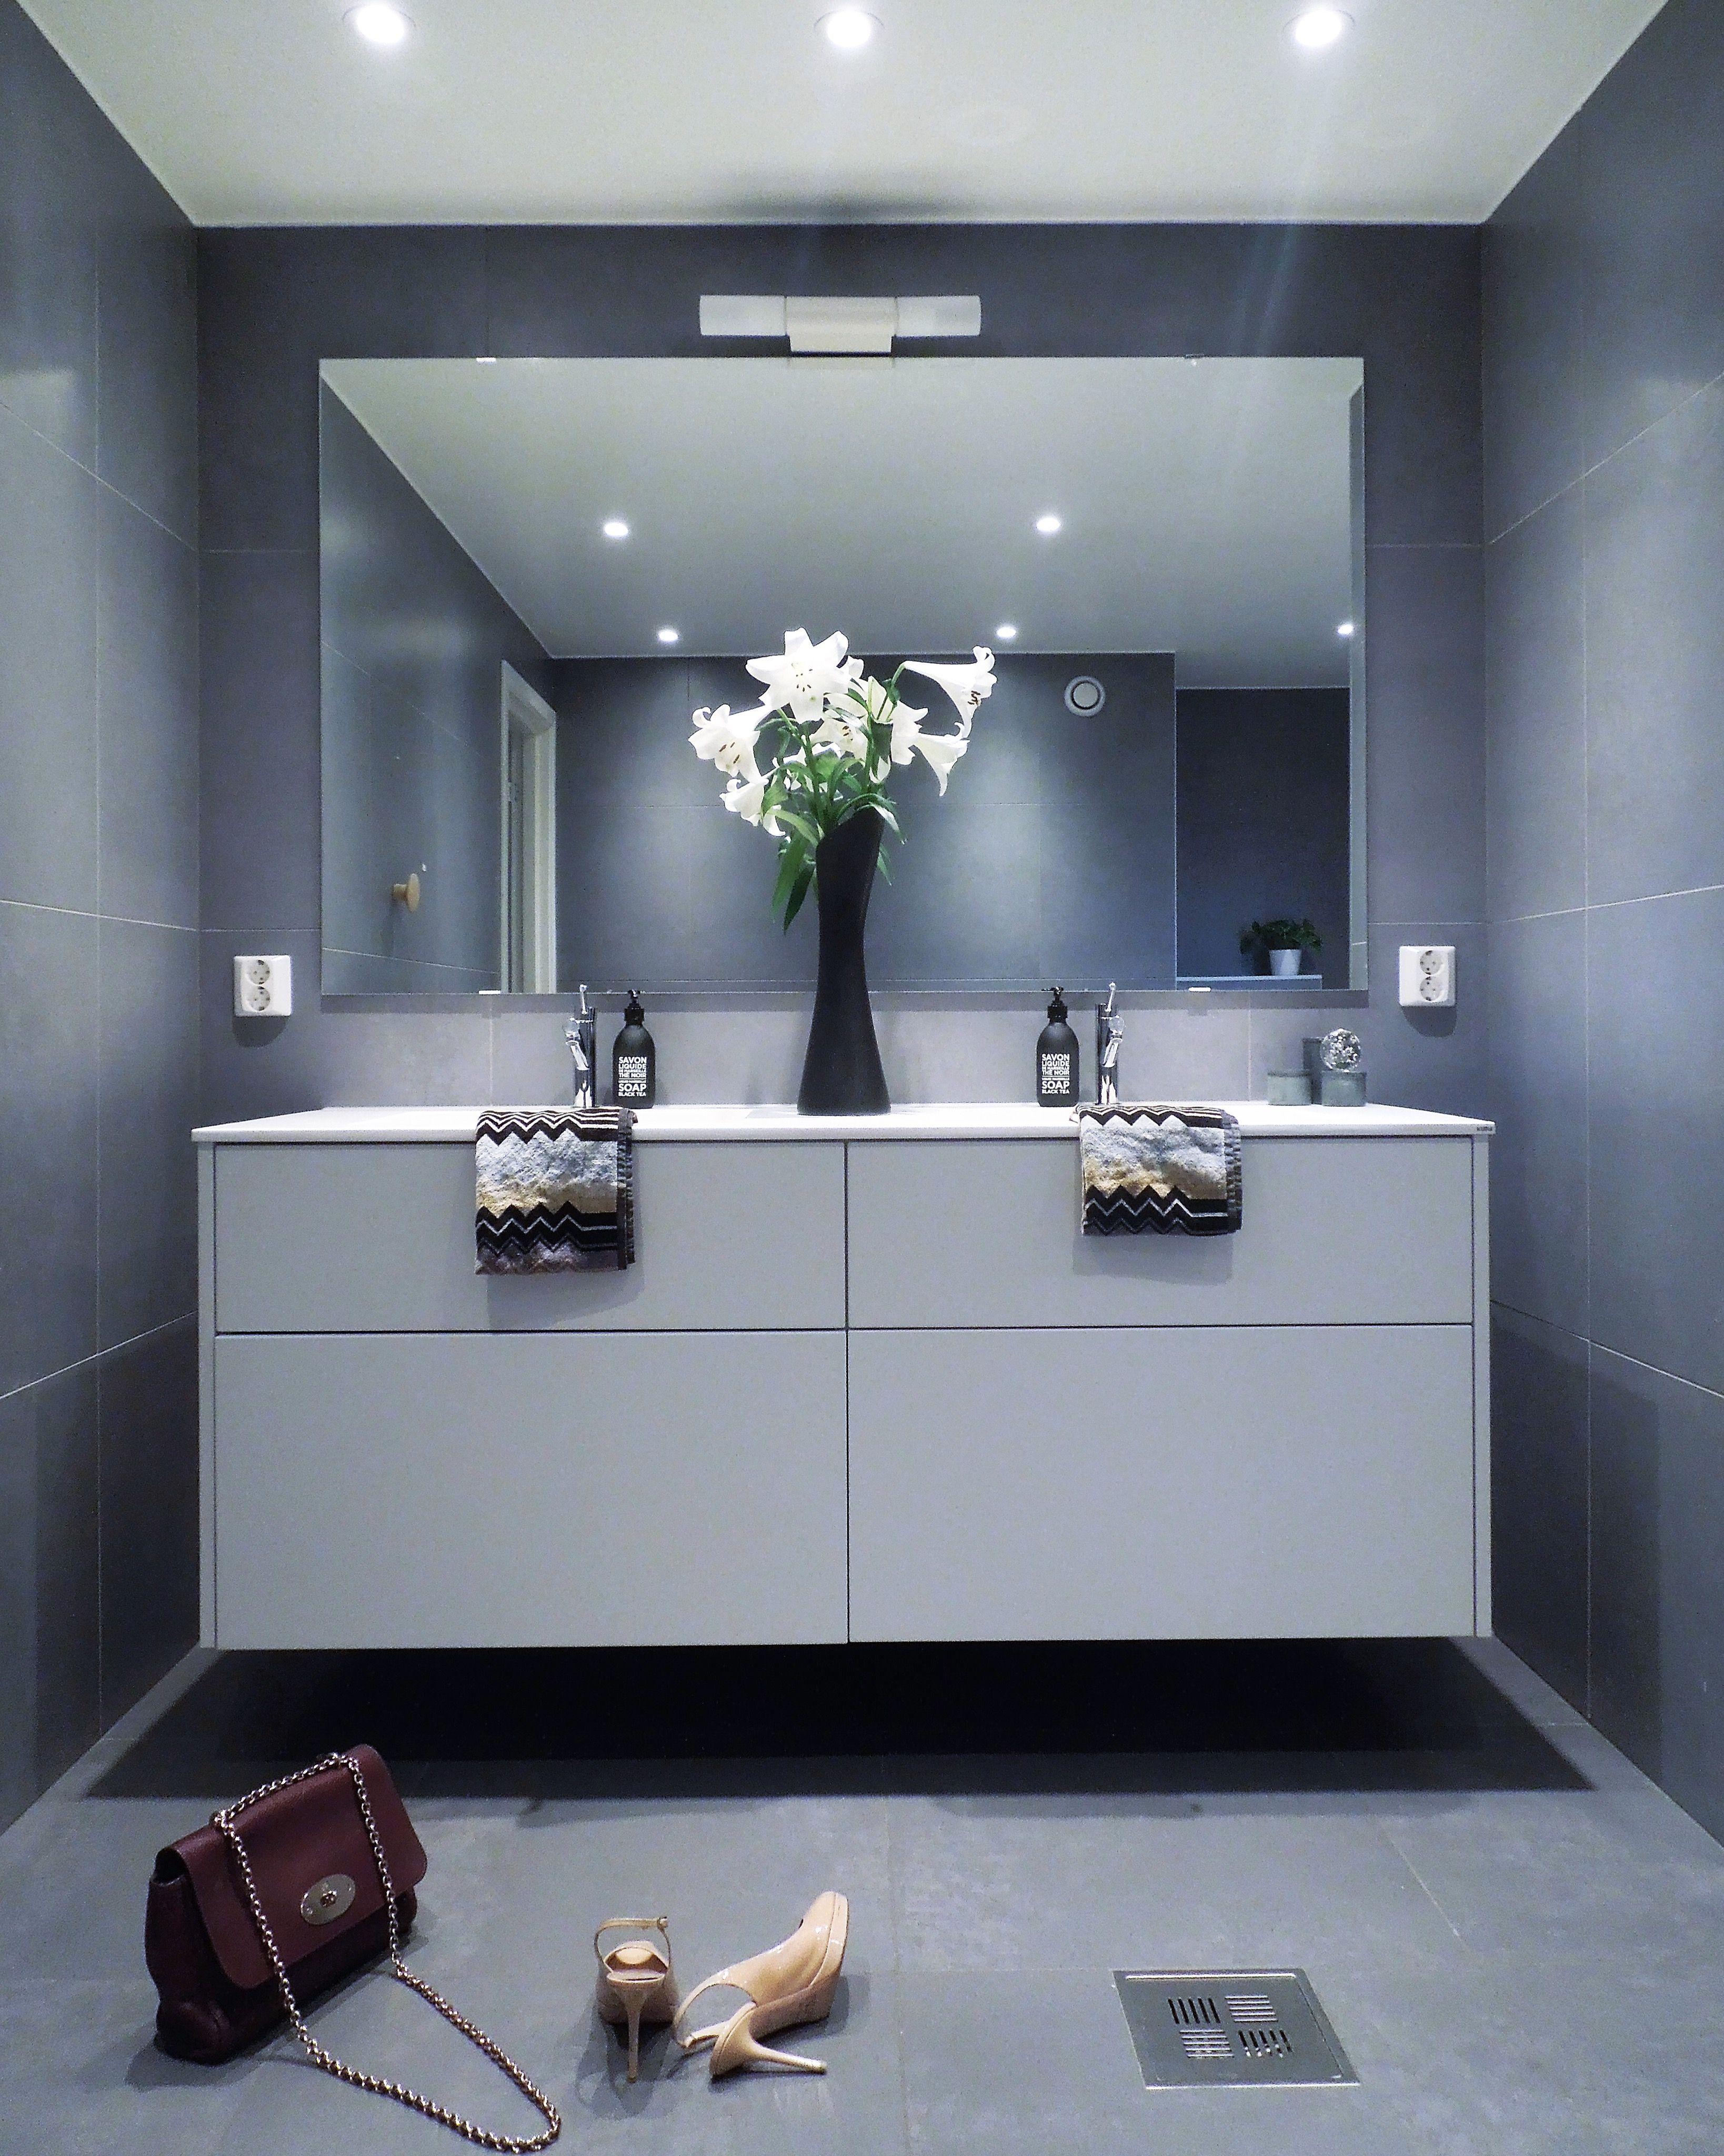 bathroom by @frutanem on #instagram   my own photos ig @frutanem, Badezimmer ideen